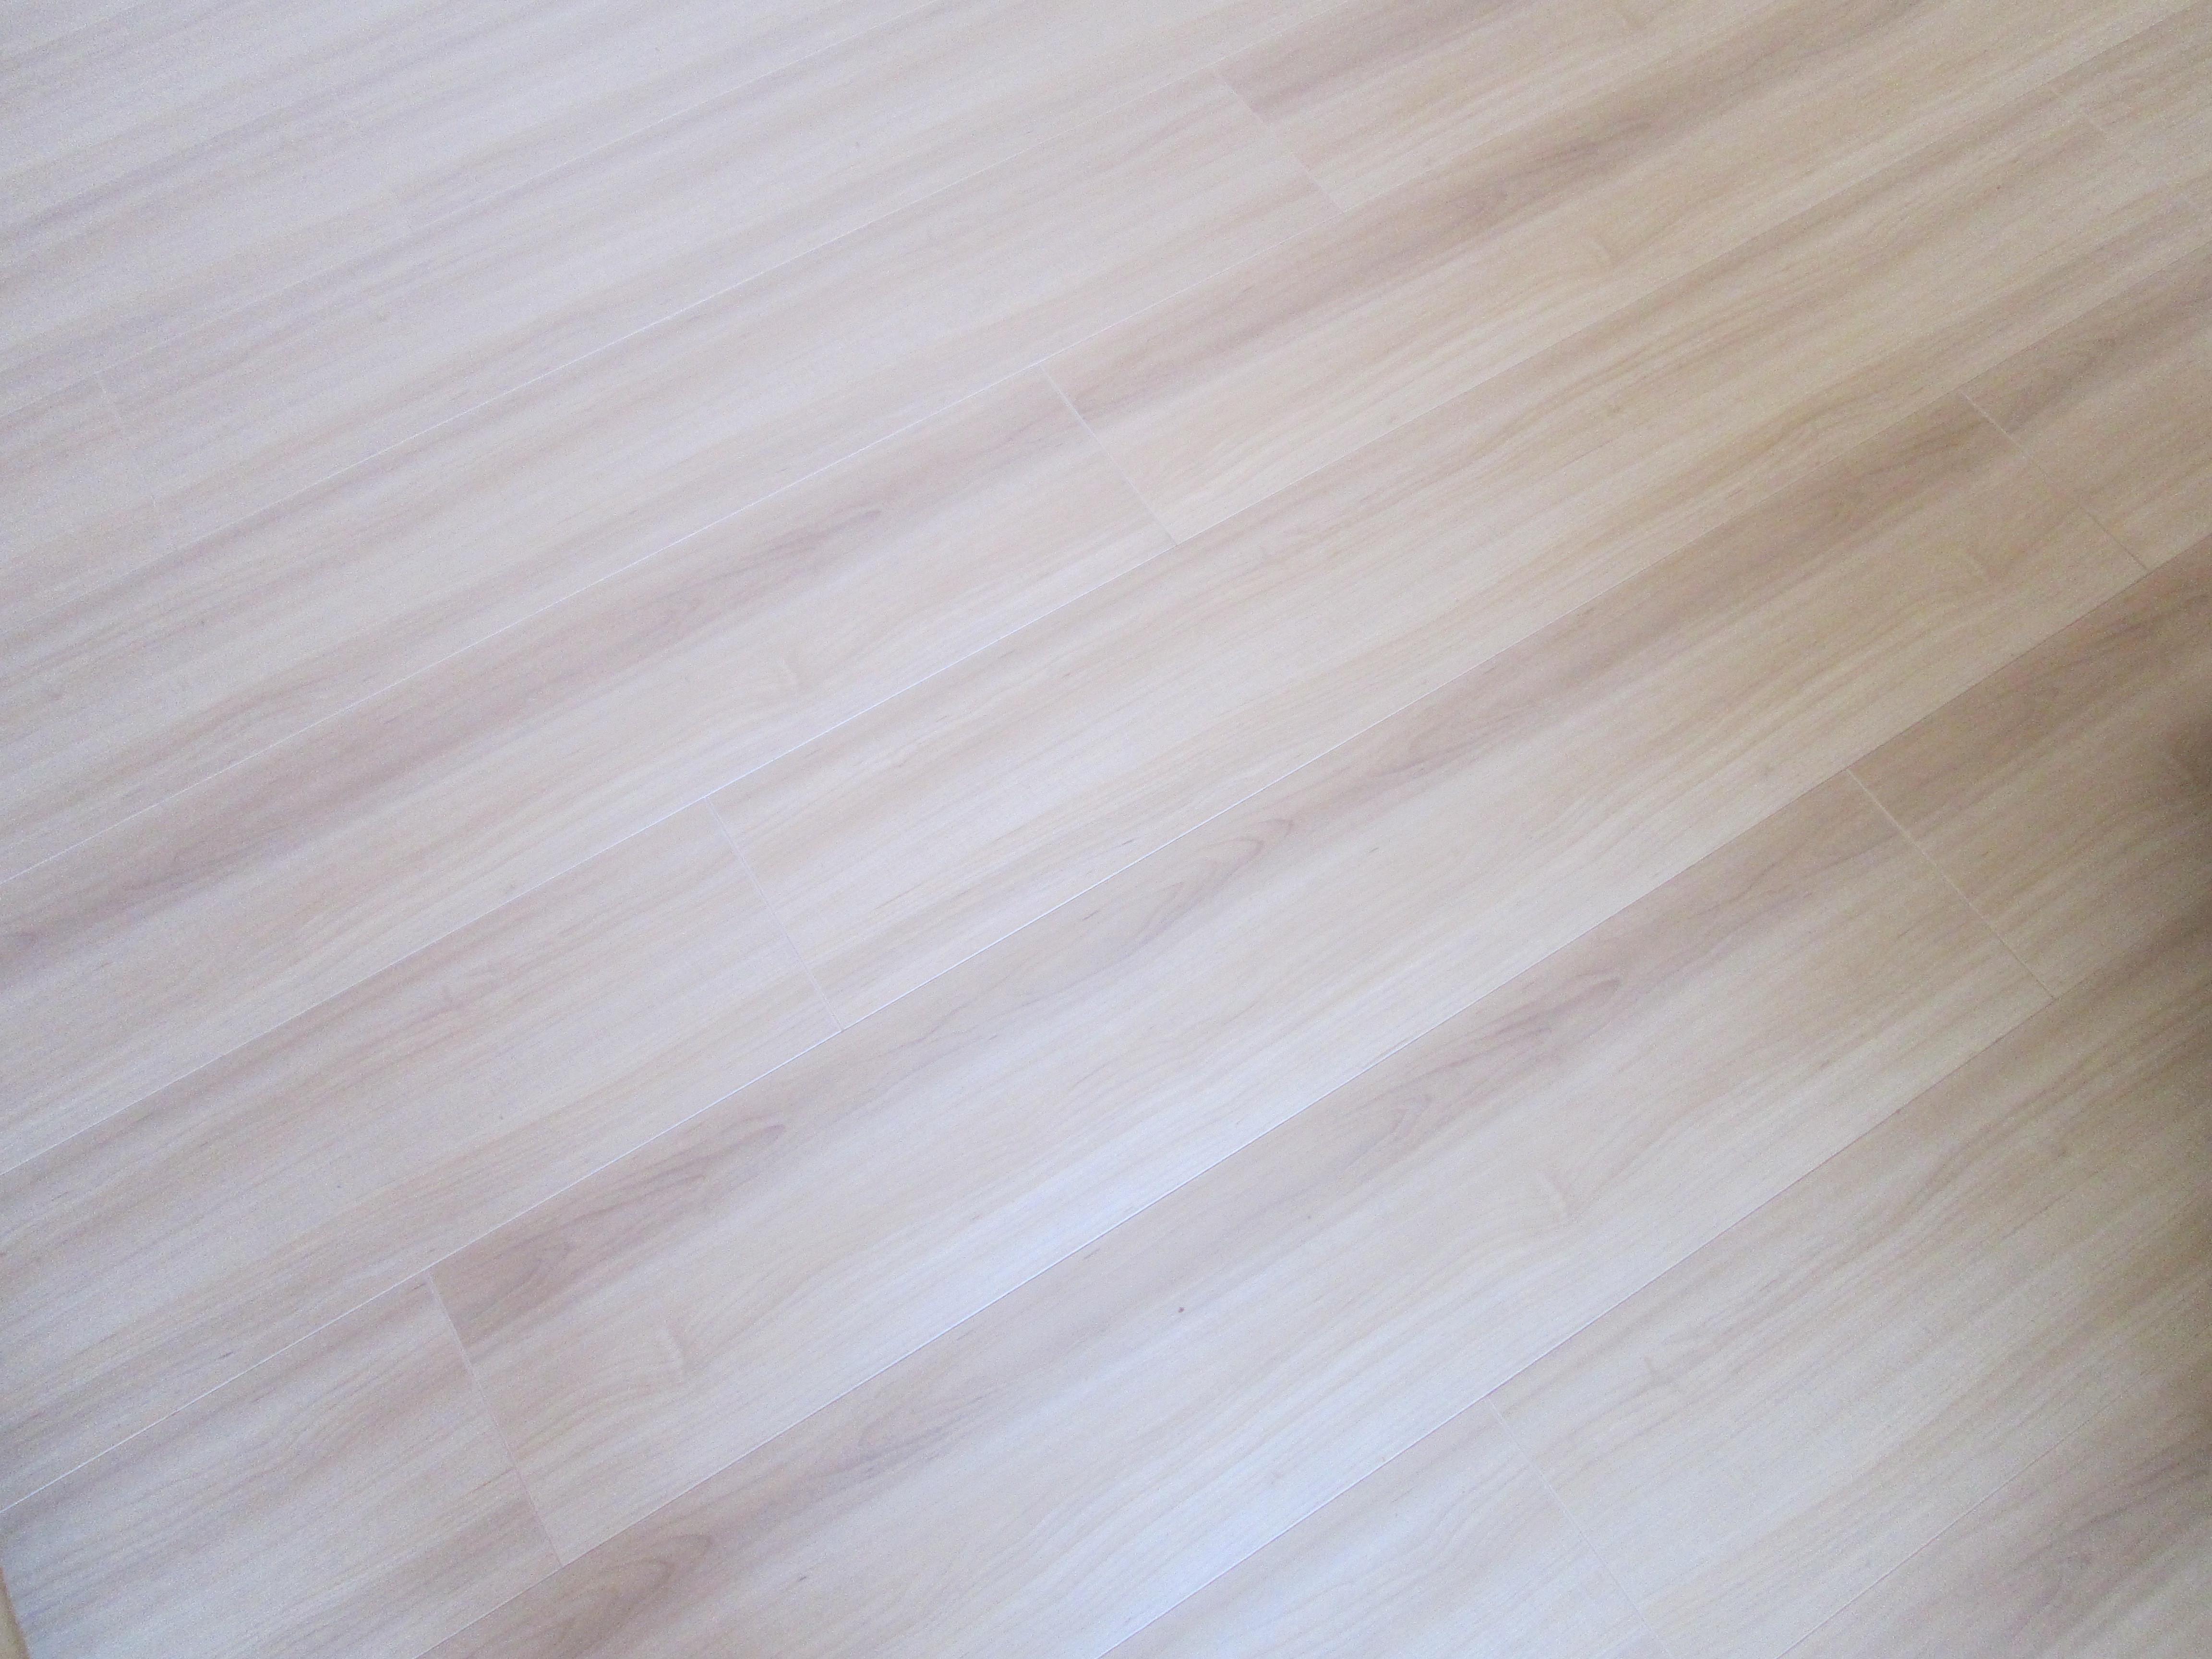 hardwood flooring store burlington ontario of ifloors with regard to floorloc ruby pastel maple